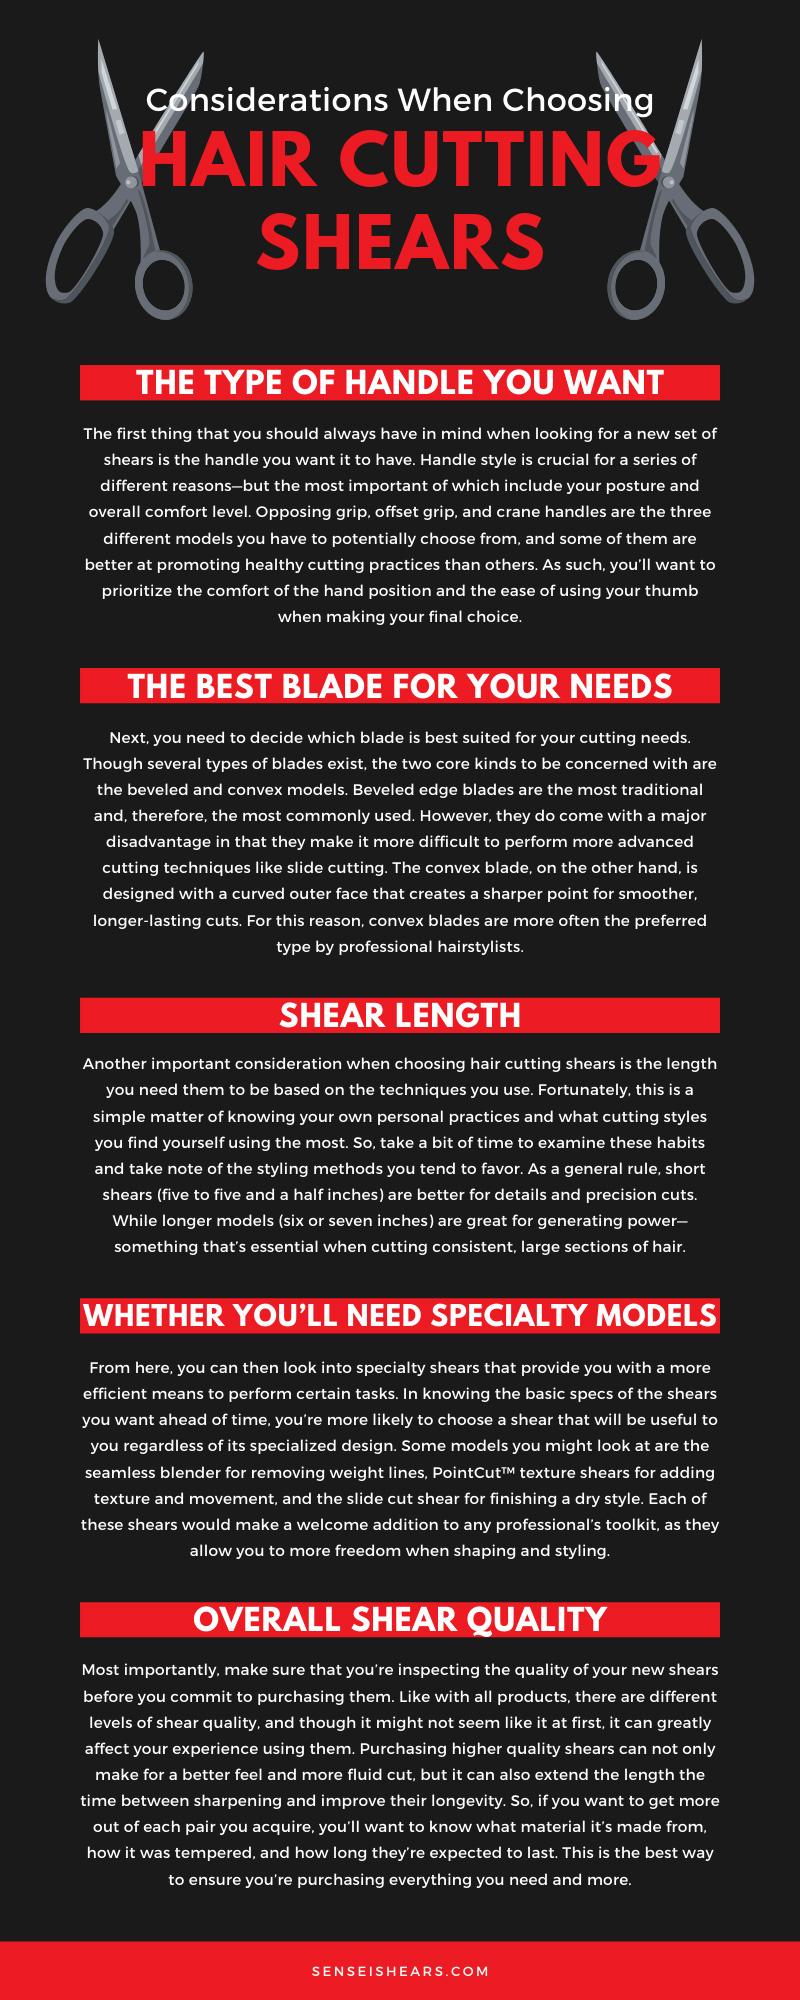 Considerations When Choosing Hair Cutting Shears